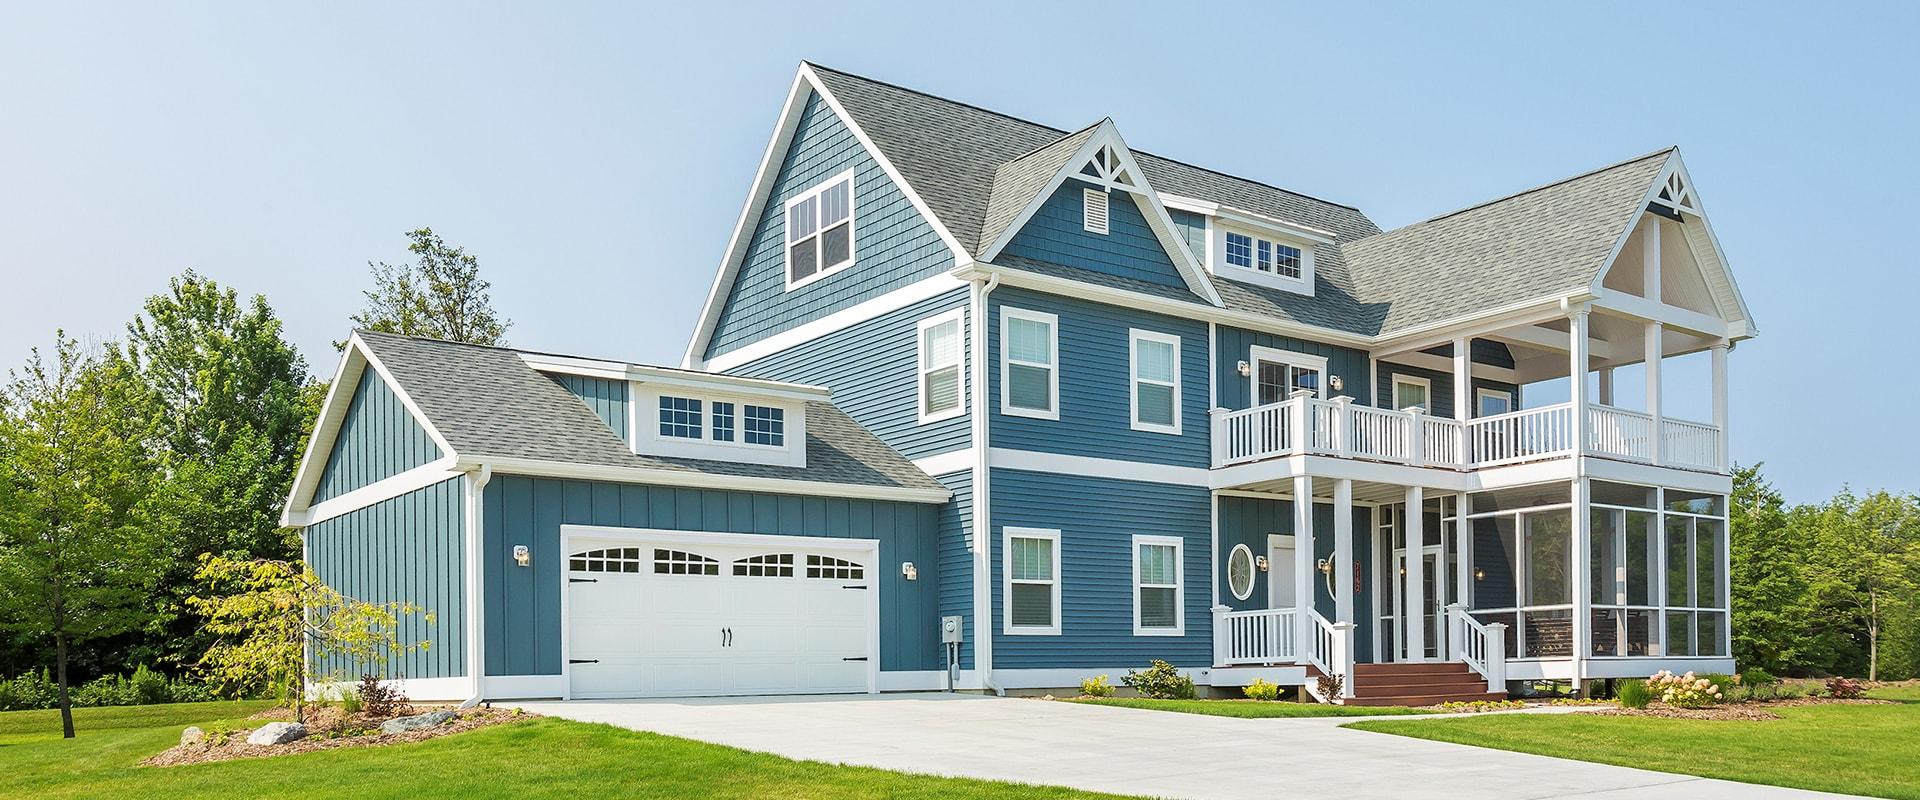 Home - Residential Builders